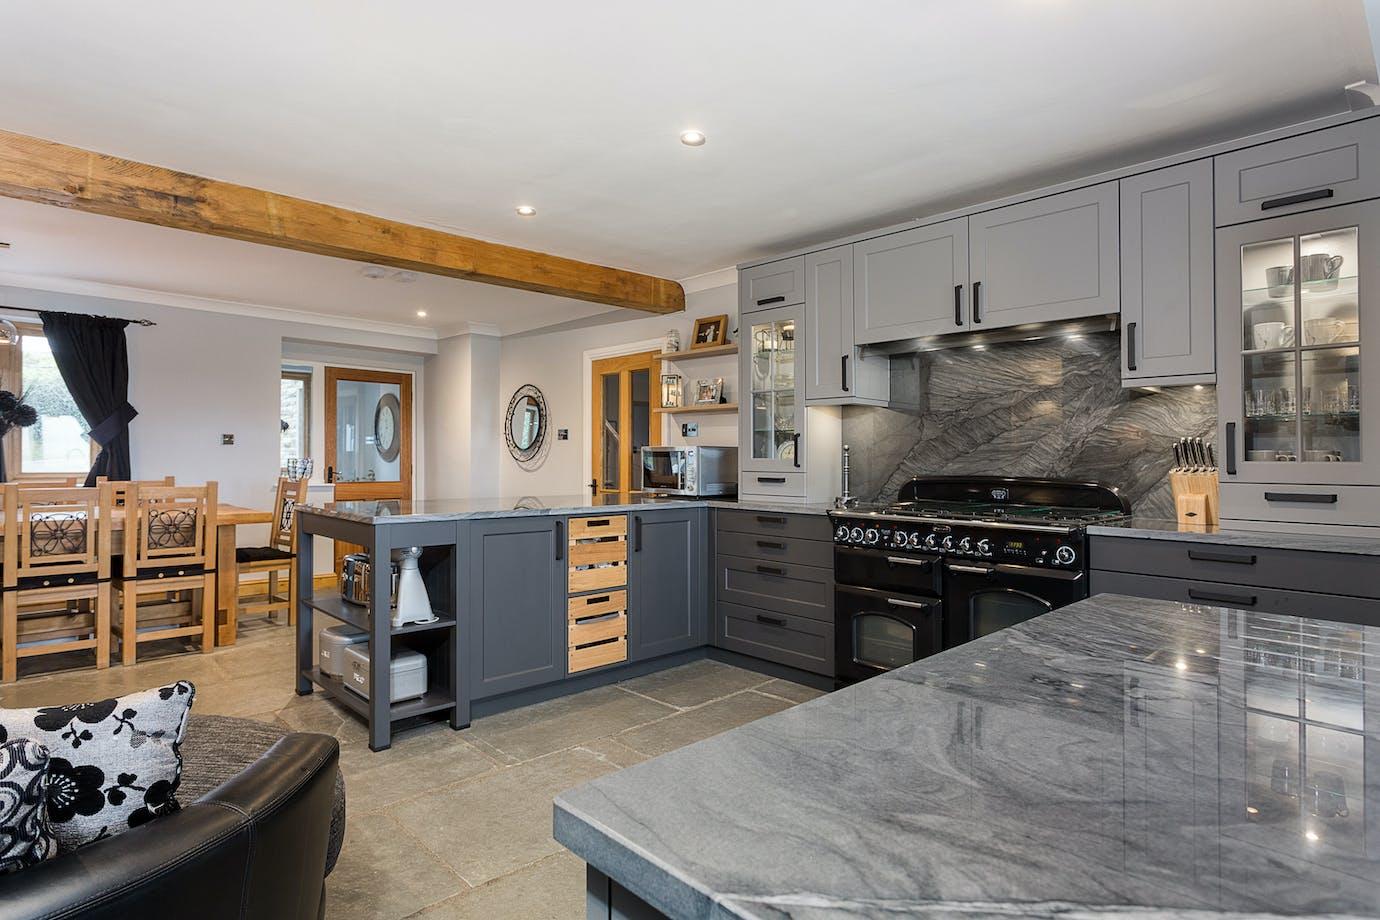 Lava Black and Agate Grey kitchen